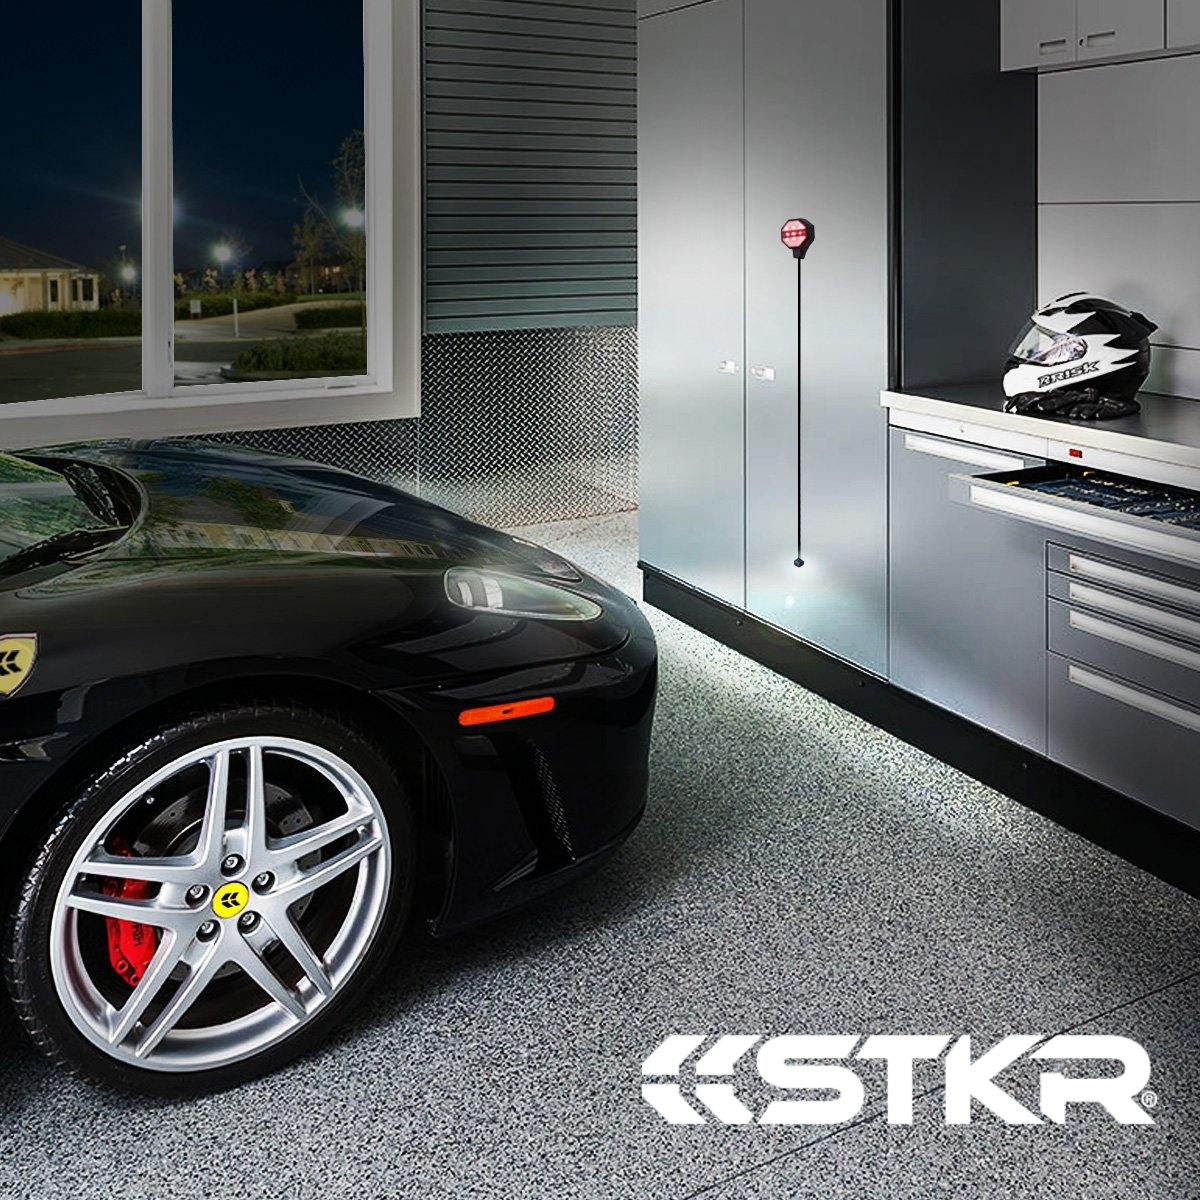 STKR Concepts